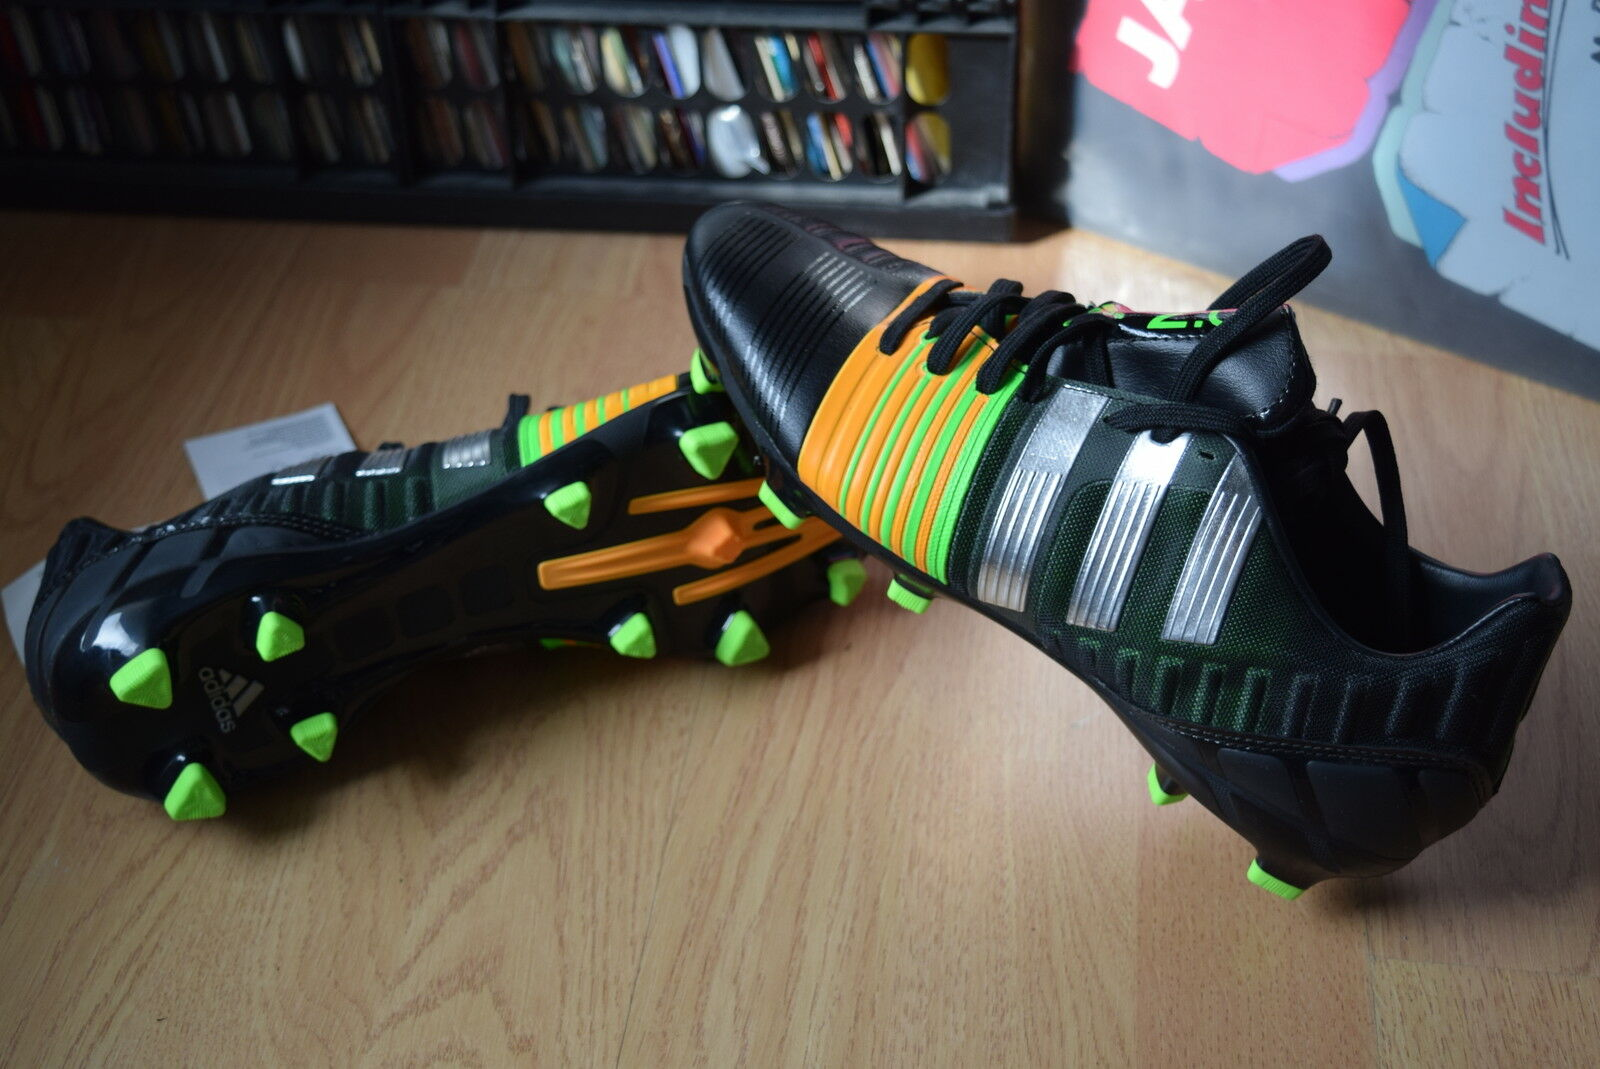 Adidas Nitrocharge 2.0 FG 42  Fußballschuhe Protator Protator Protator M29852 F50  | Ab dem neuesten Modell  4be35c